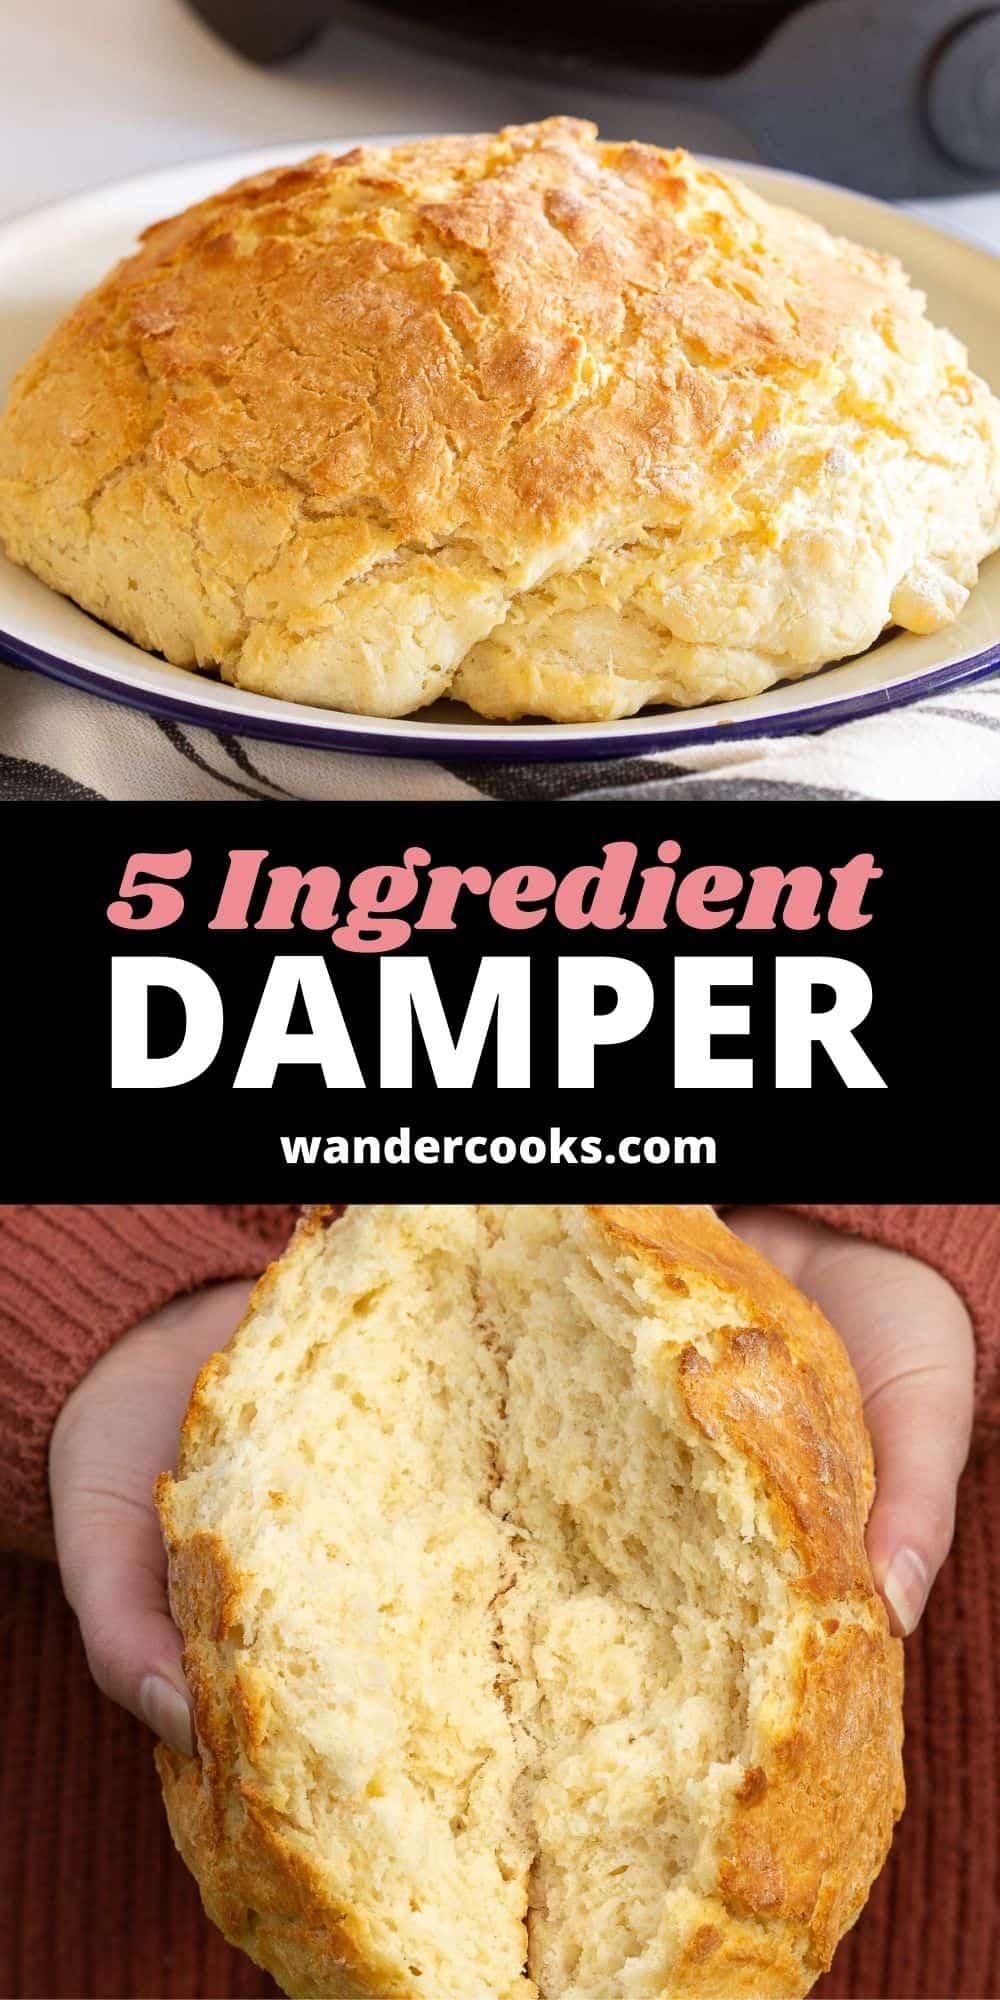 5 Ingredient Australian Damper Recipe